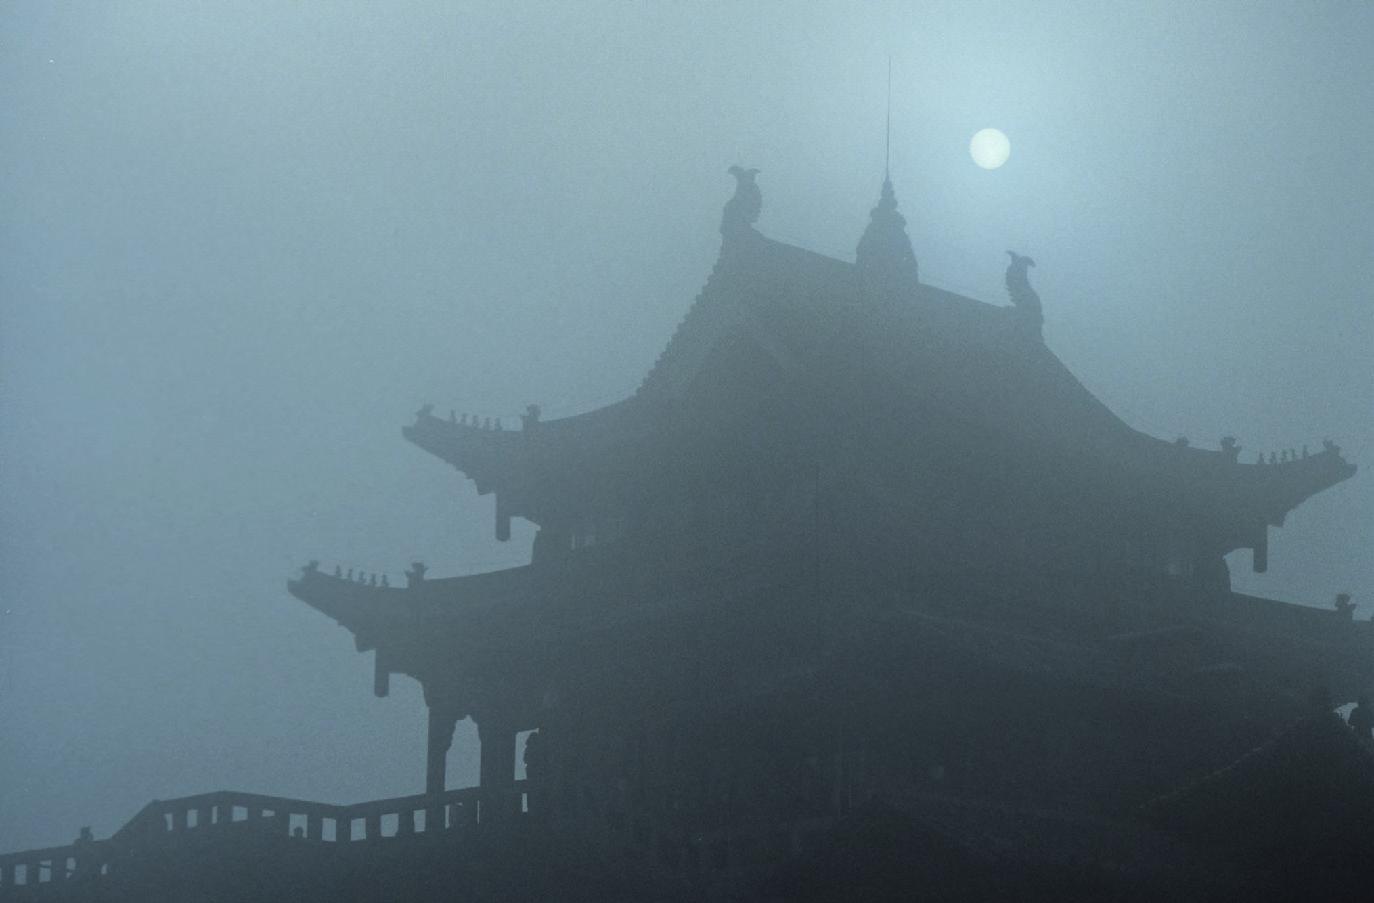 Kloster im Nebel Emei Shan, Provinz Sichuan, China